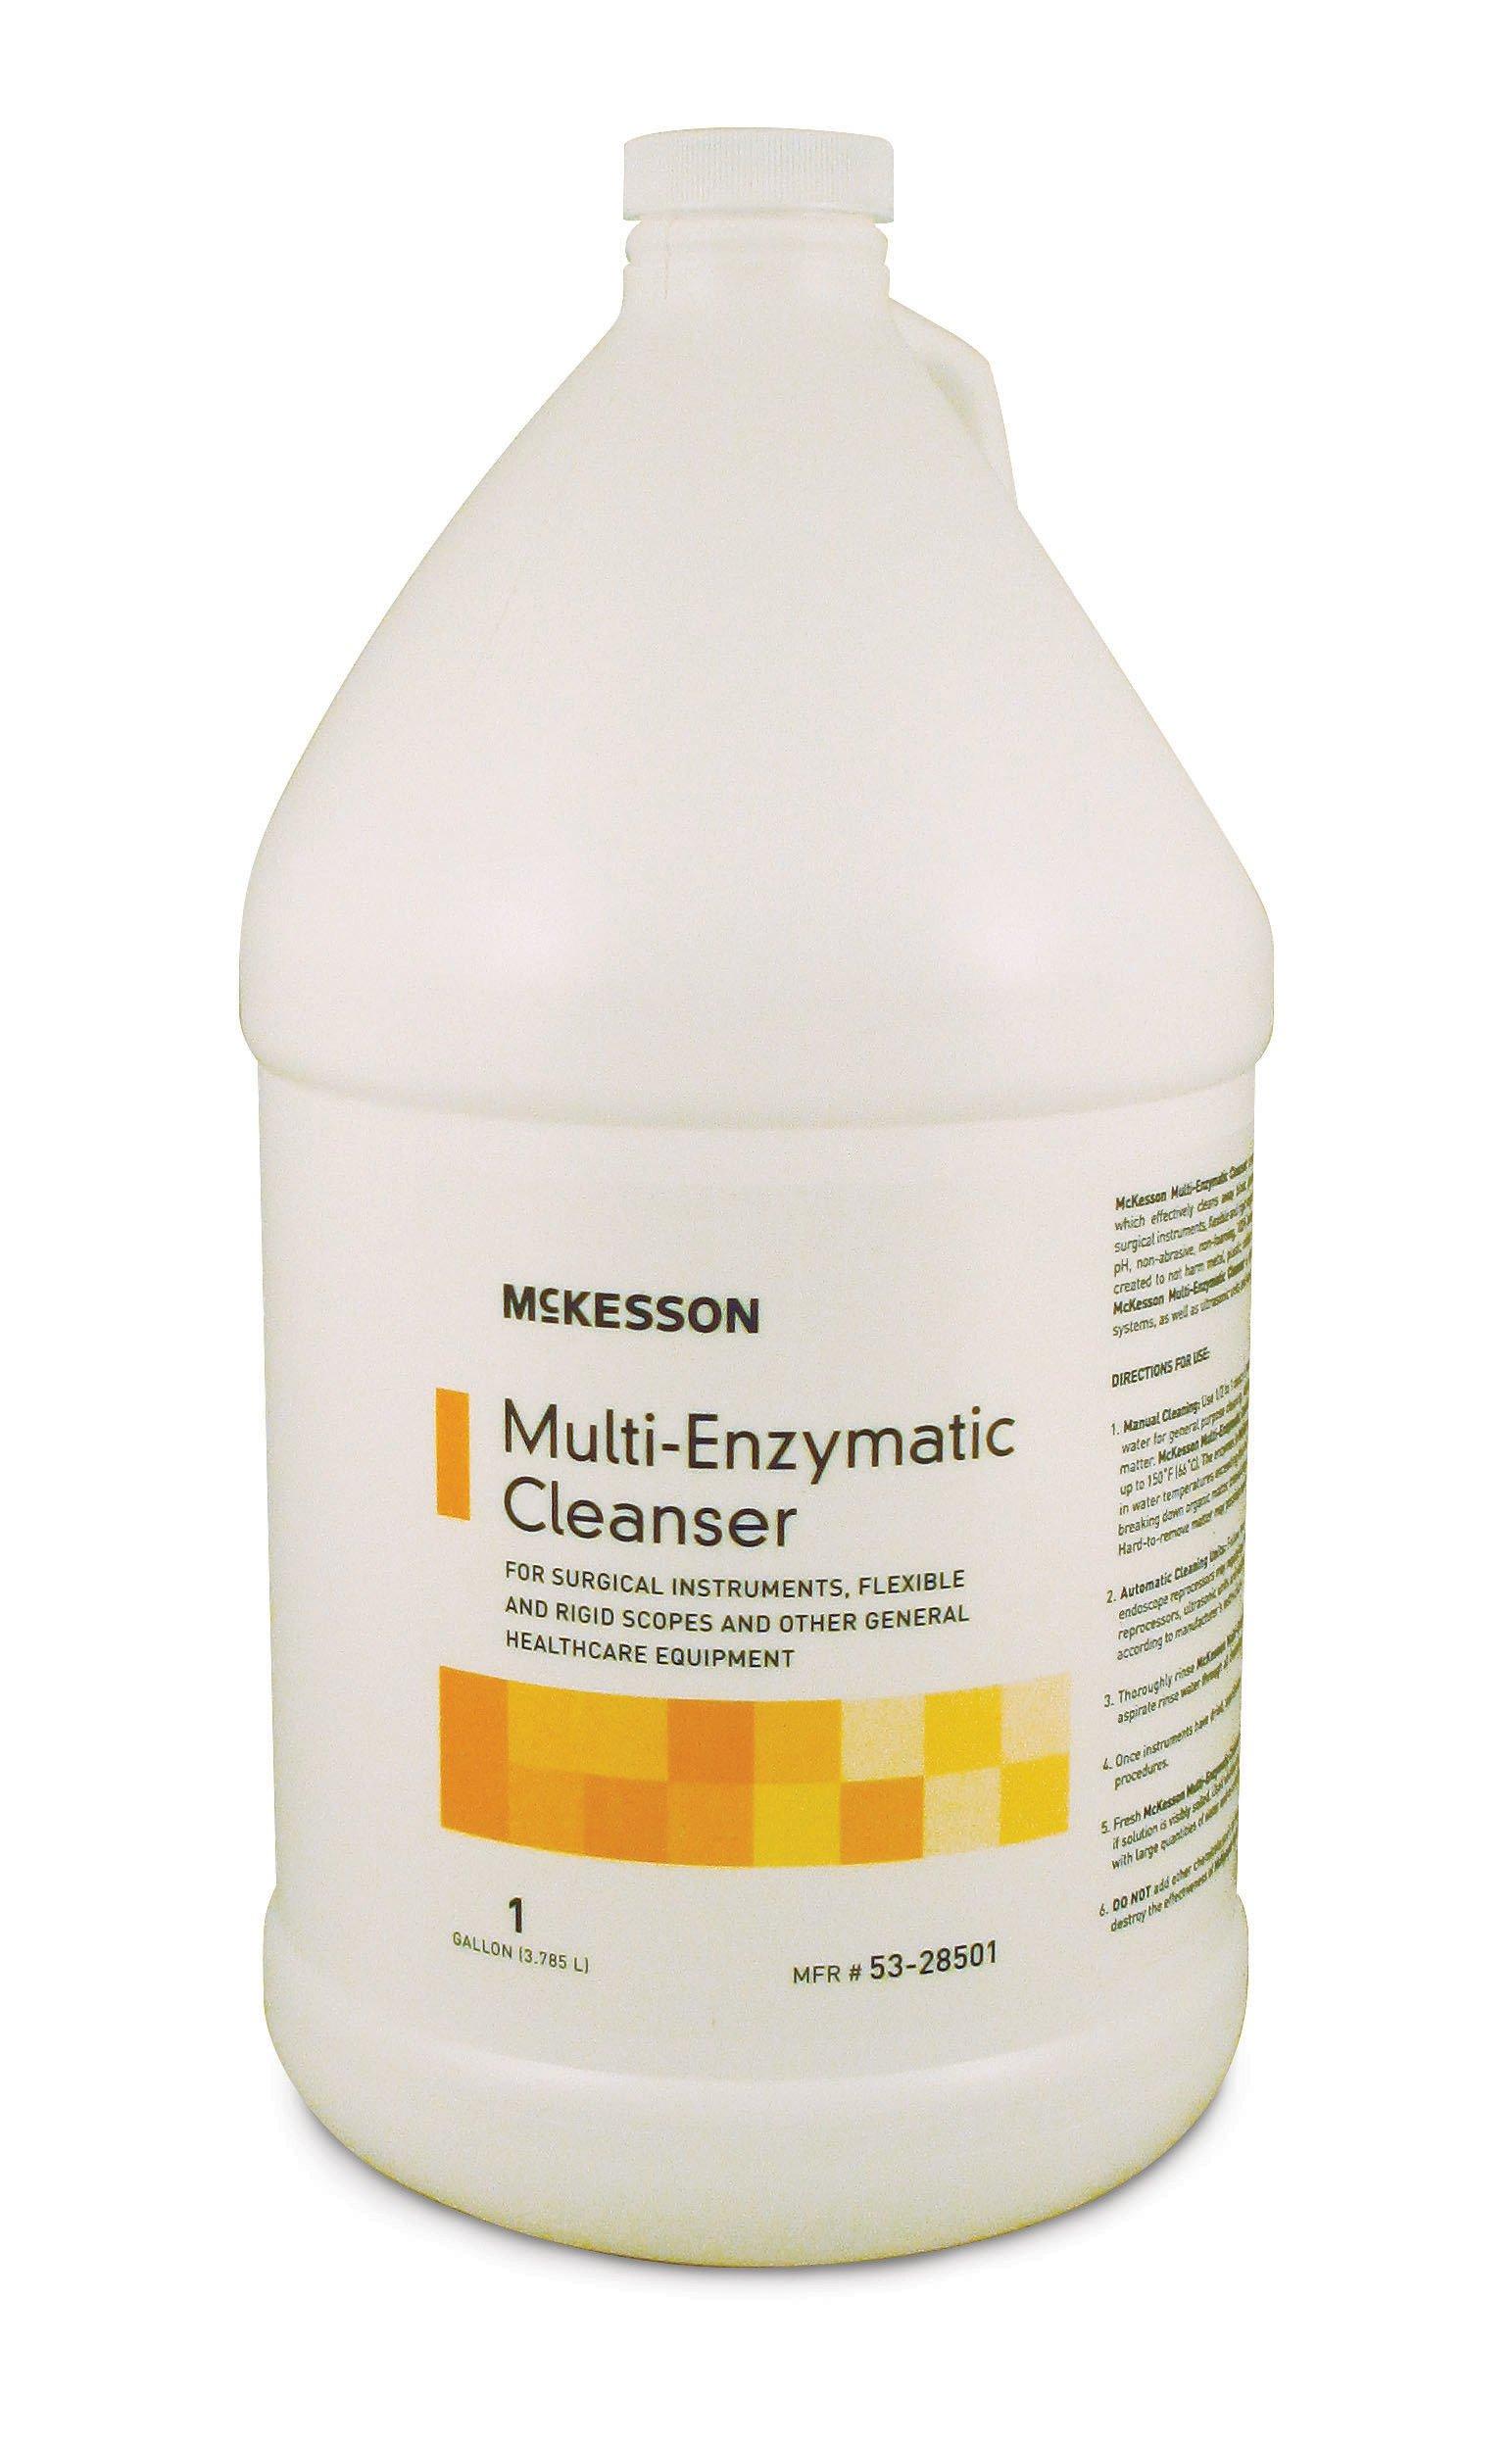 Multi-Enzymatic Instrument Detergent, McKesson, Liquid 1 gal. Jug Eucalyptus Spearmint Scent, 53-28501 - EACH